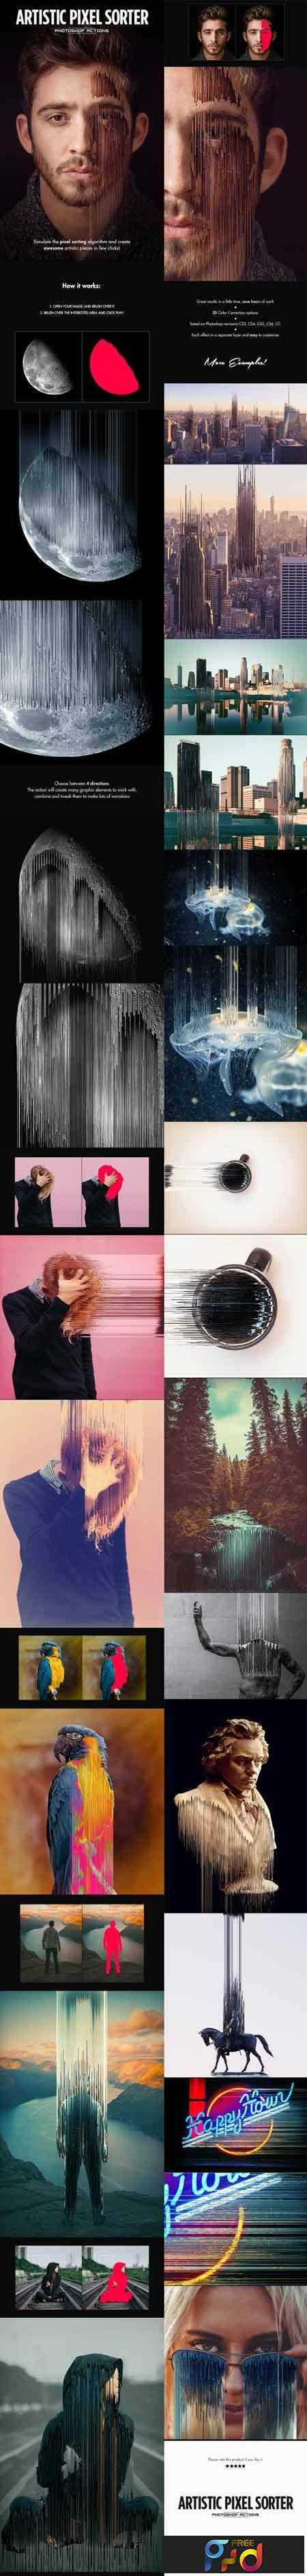 1803141 Artistic Pixel Sorter - Photoshop Actions 21379481 1